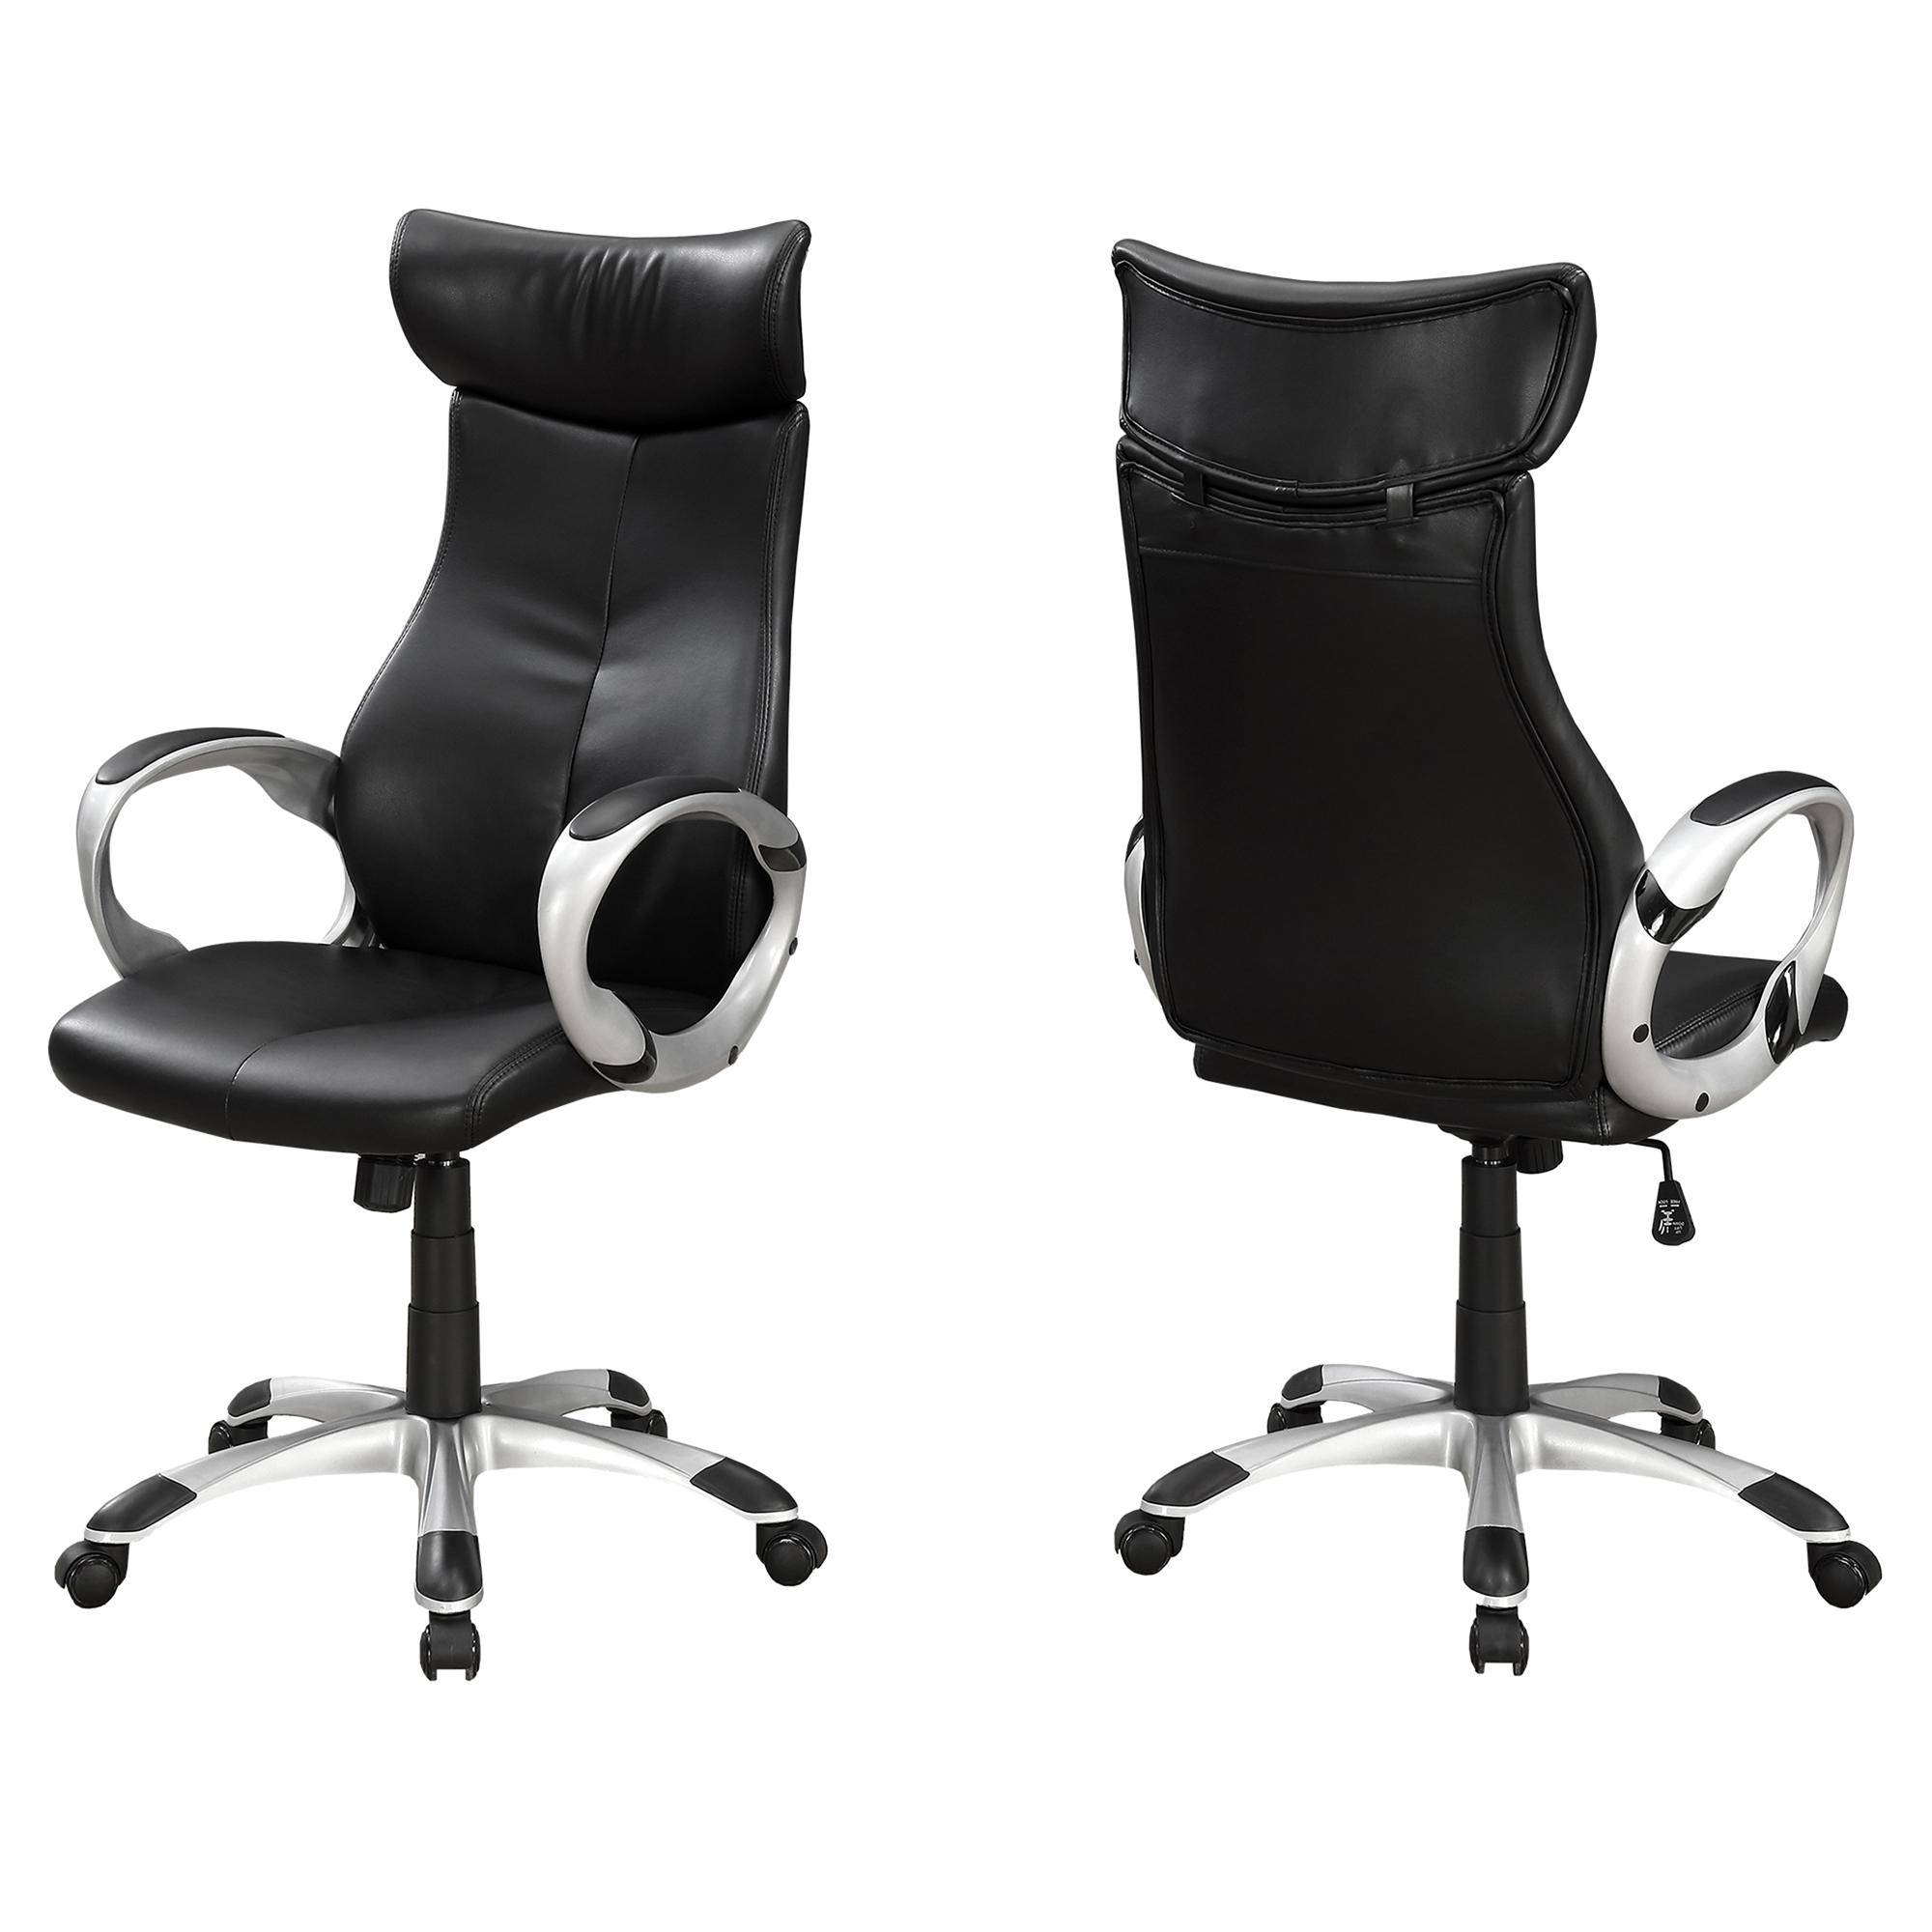 "26"" x 25.5"" x 99"" Black Silver Foam Metal  High Back Office Chair"